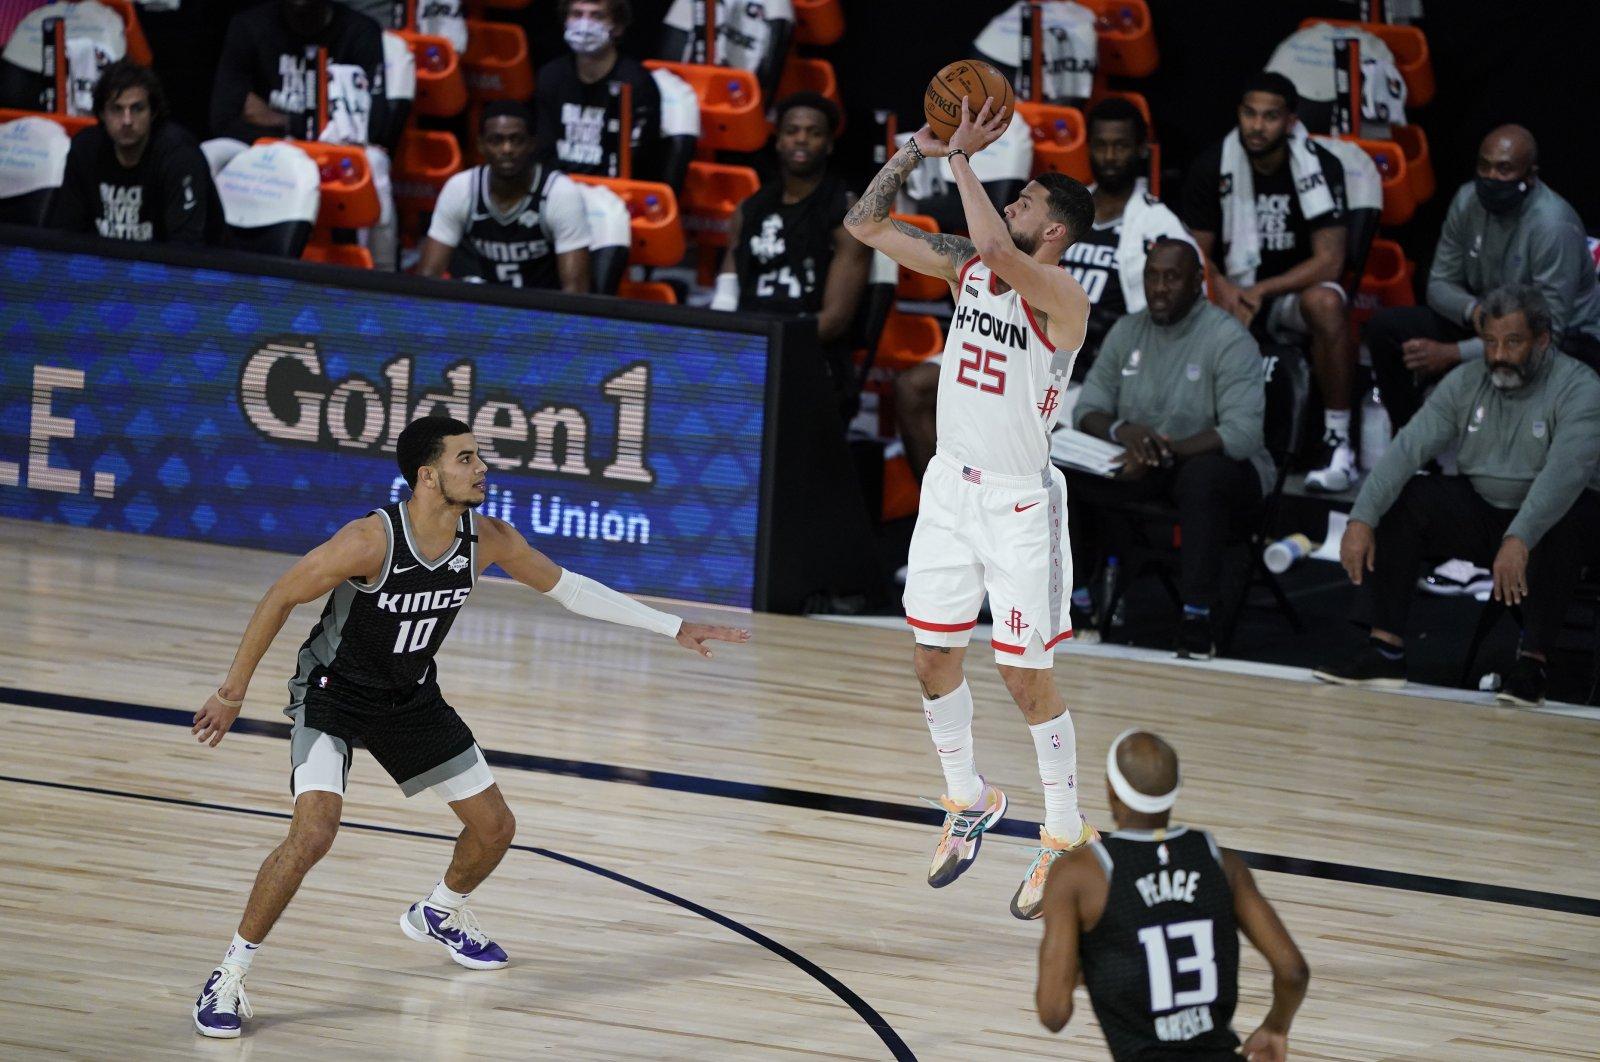 Houston Rockets' Austin Rivers shoots over Sacramento Kings' Justin James (10) during an NBA game in Lake Buena Vista, Florida, U.S., Aug. 9, 2020. (AP Photo)